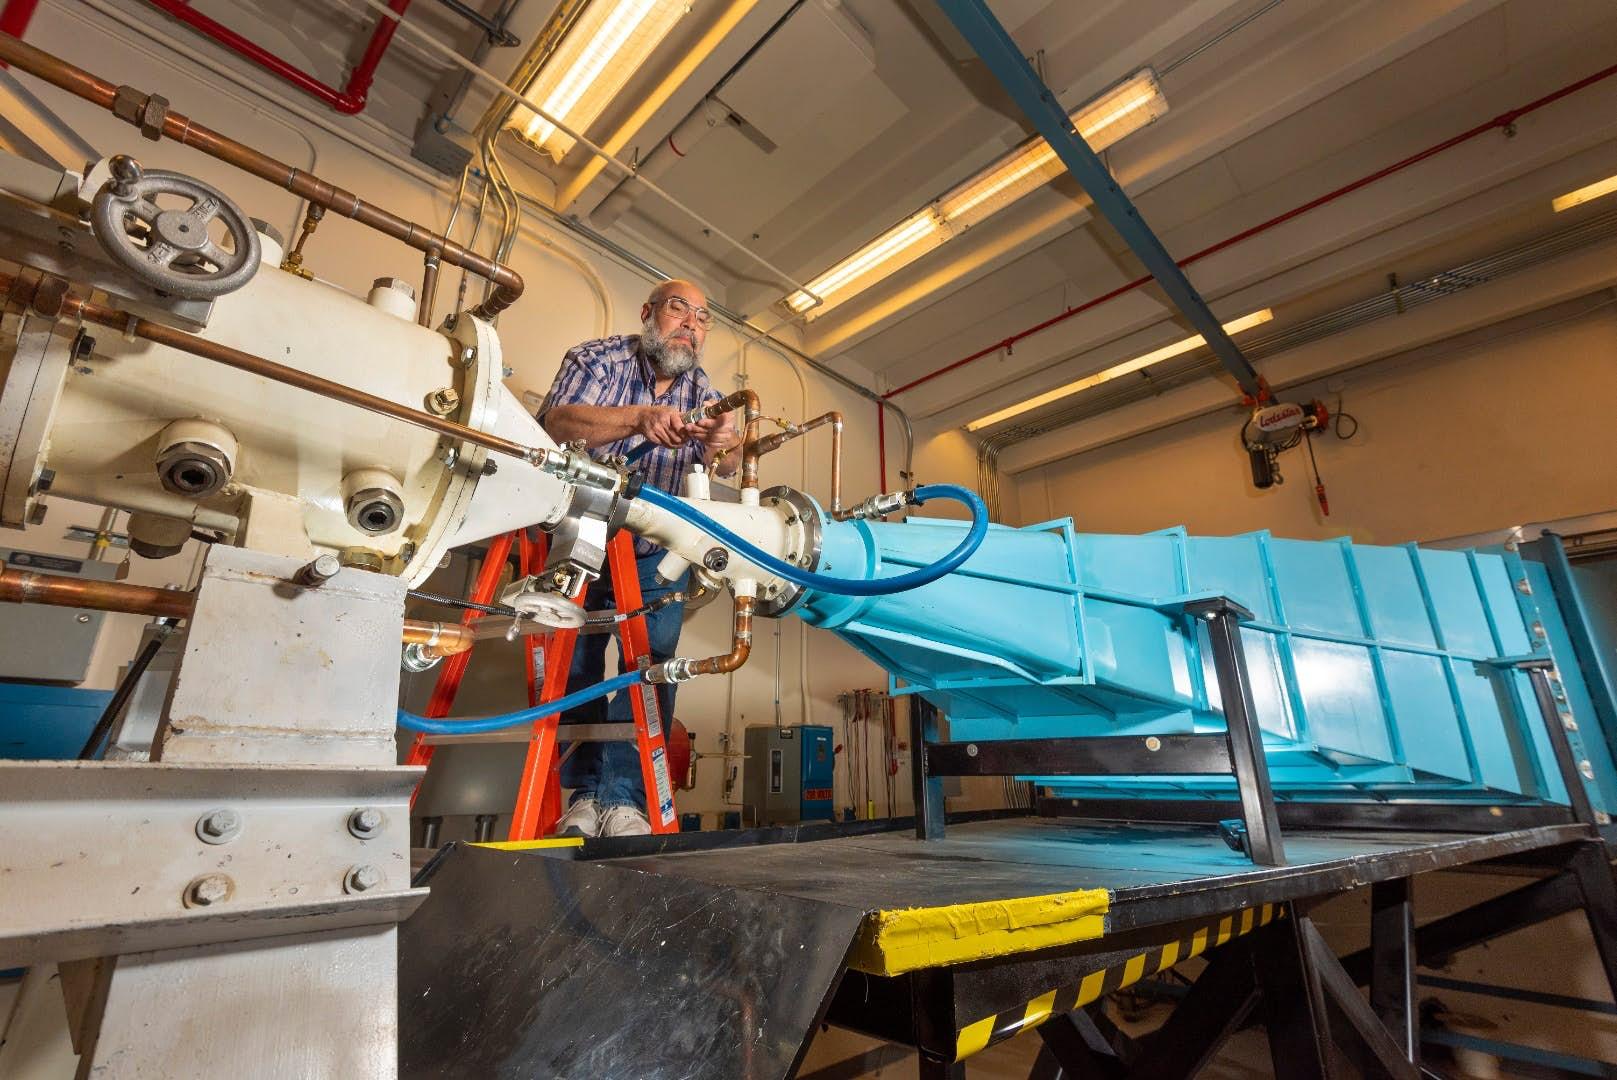 EMES, ElectroMagnetic Environment Simulator, a jeho operátor Leonard Martinez. Kredit: Sandia National Laboratories/Randy Montoya